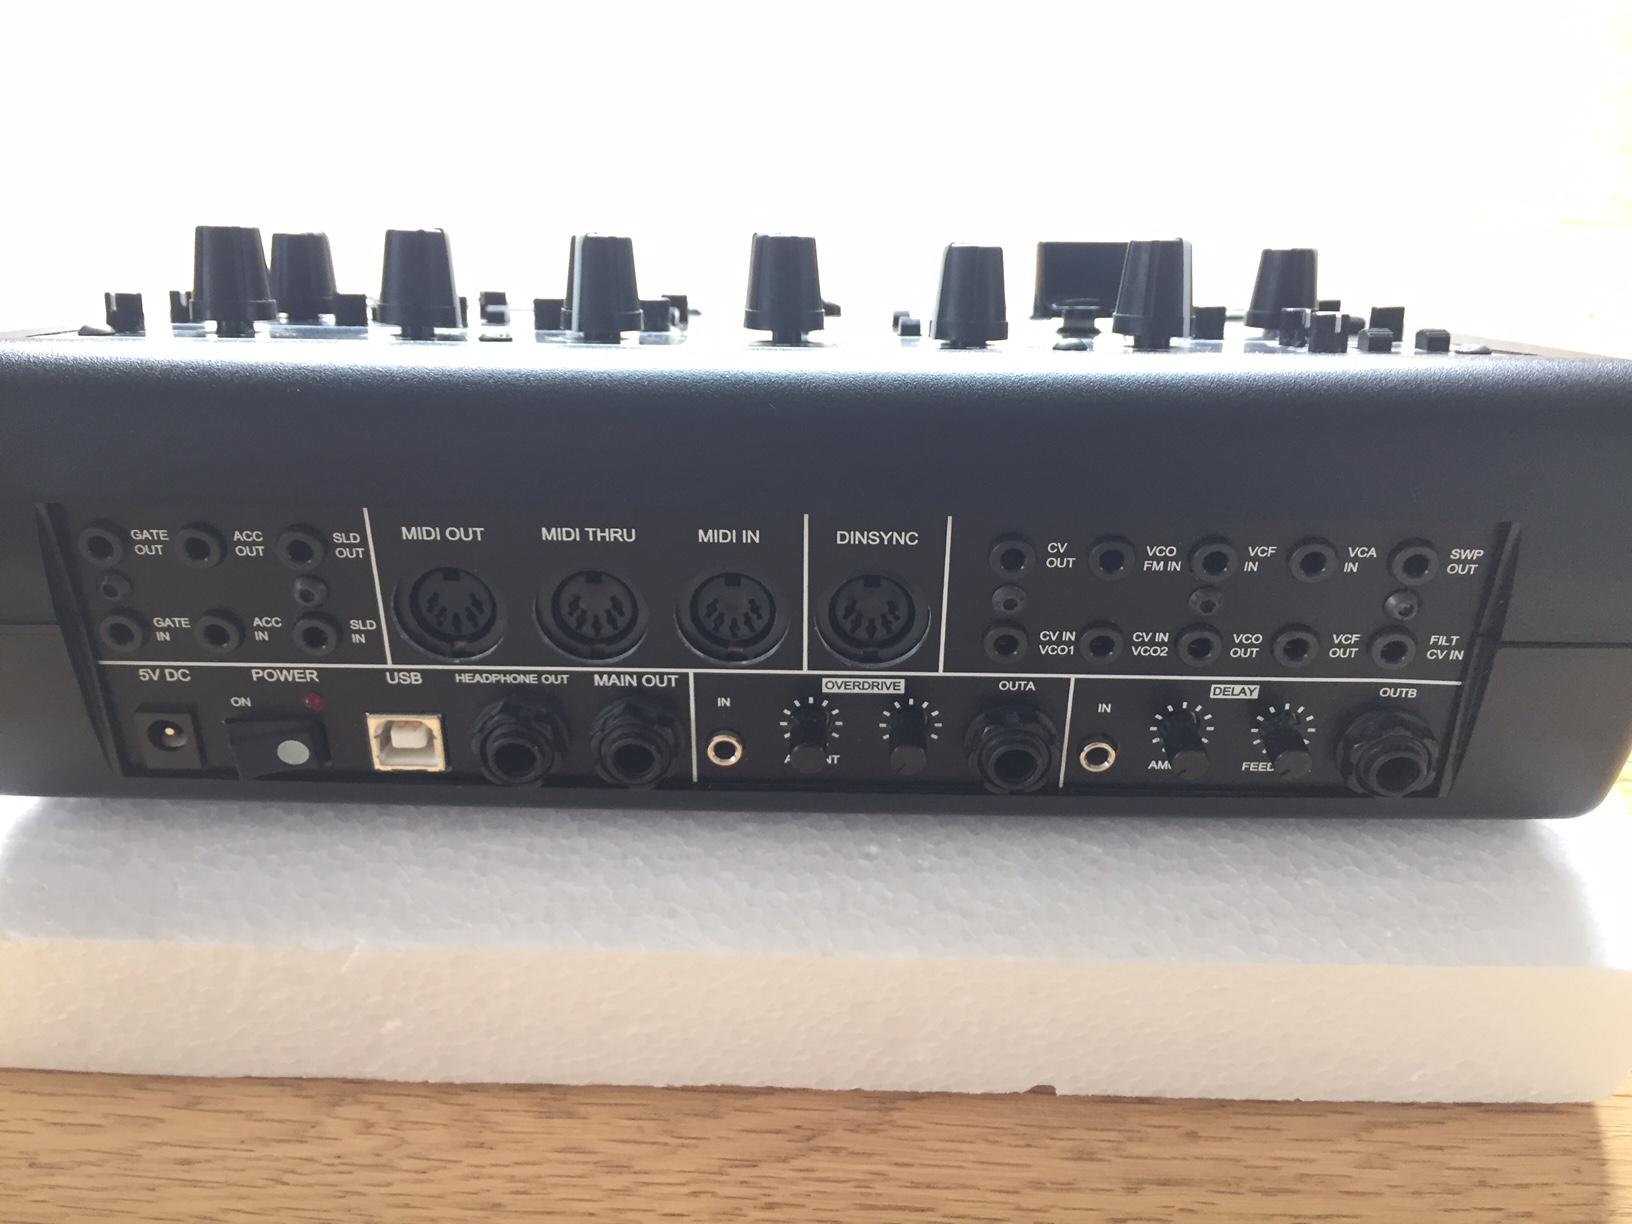 FS(EU): x0xb0x/xoxbox modded (2nd VCO,FM,X-Mod, ADSR, Delay